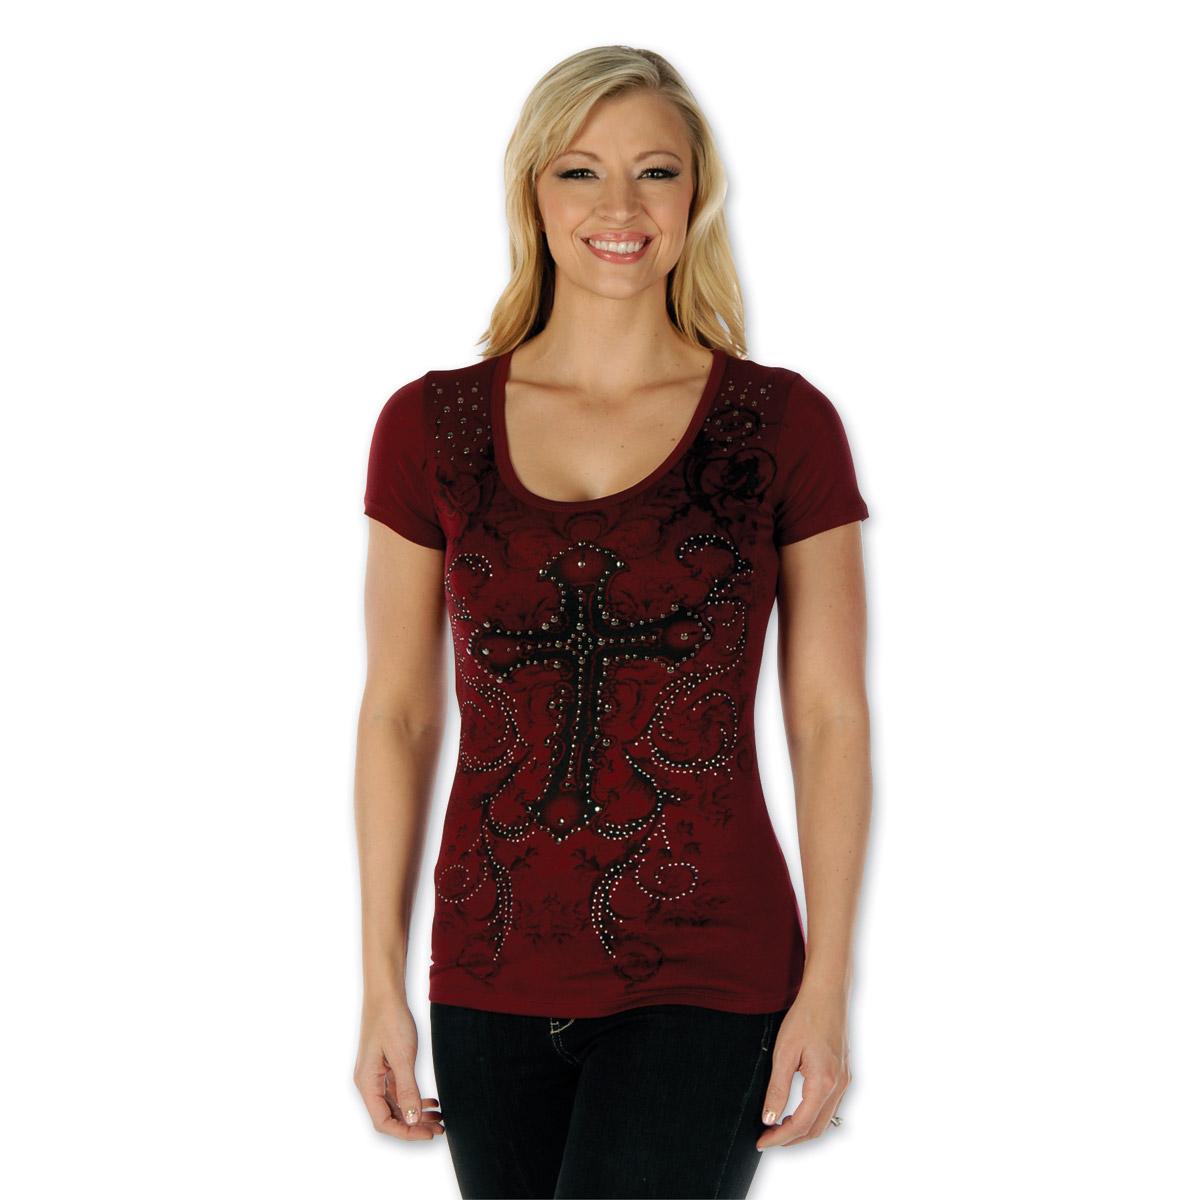 best sell Good Prices on feet shots of Liberty Wear Women's Jeweled Cross Burgundy T-Shirt - 7151-BURG-XL